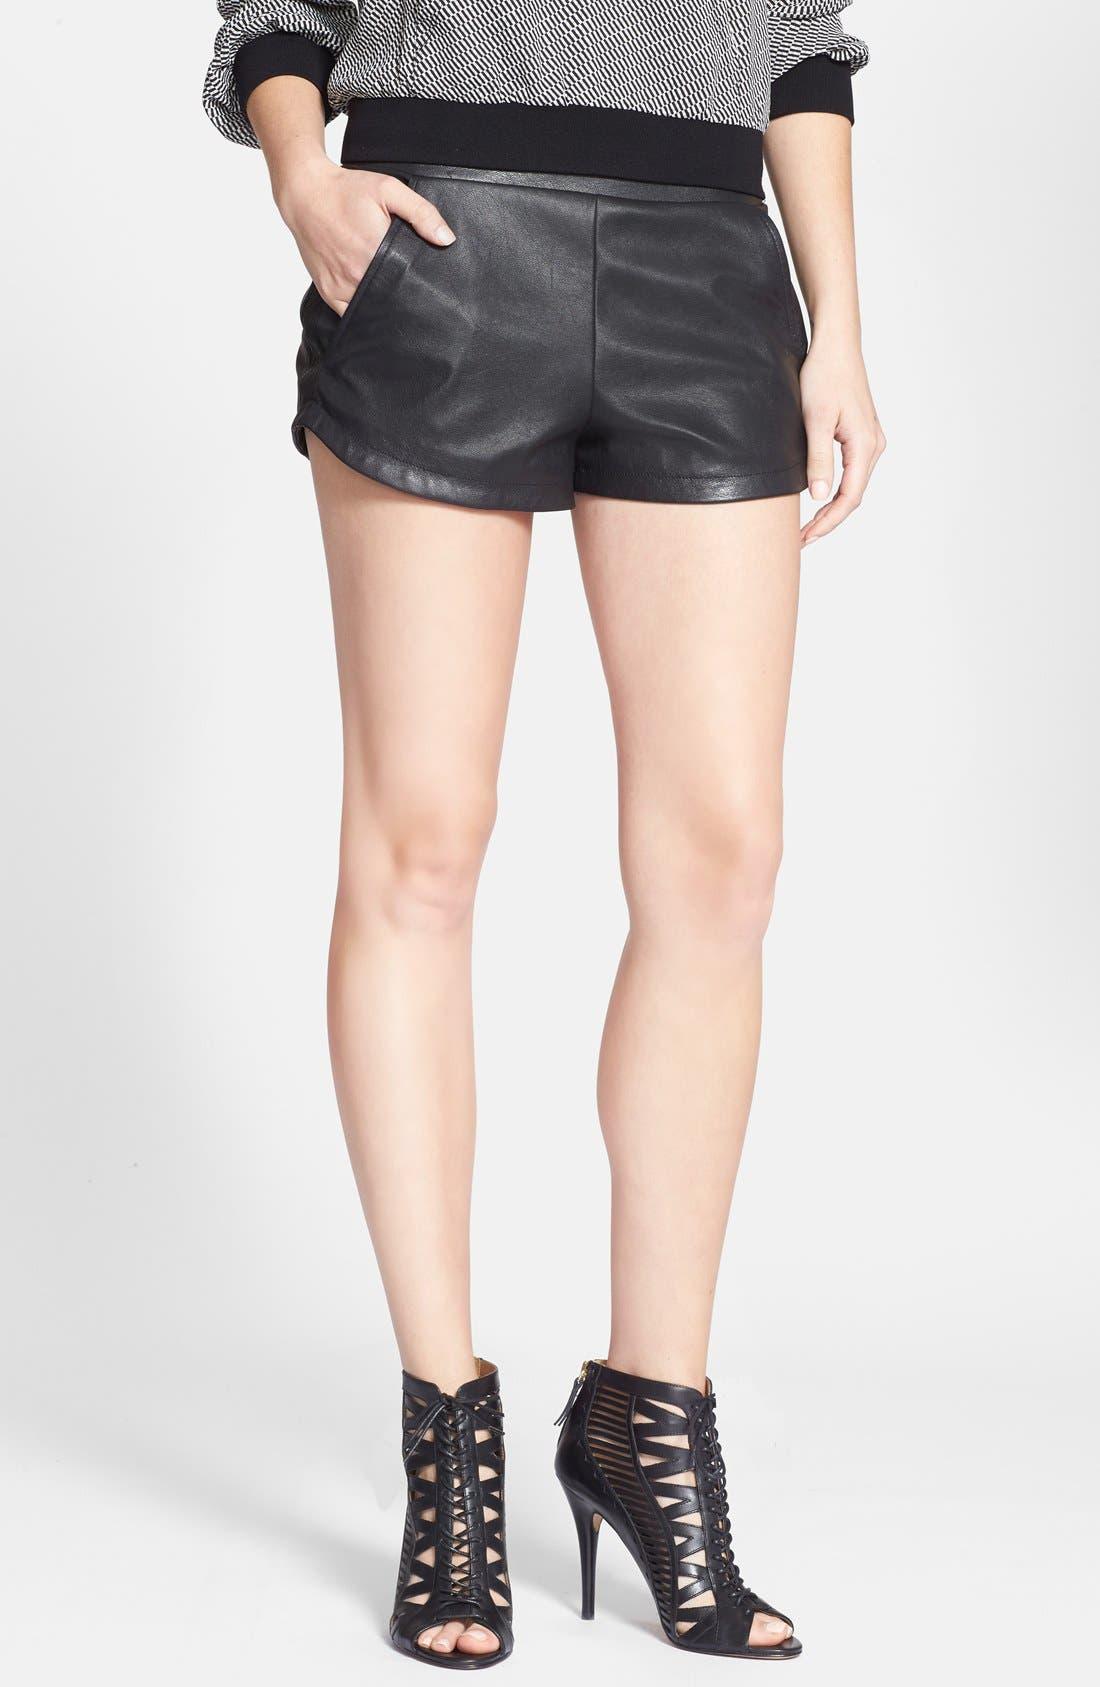 Main Image - Max & Mia Faux Leather Athletic Shorts